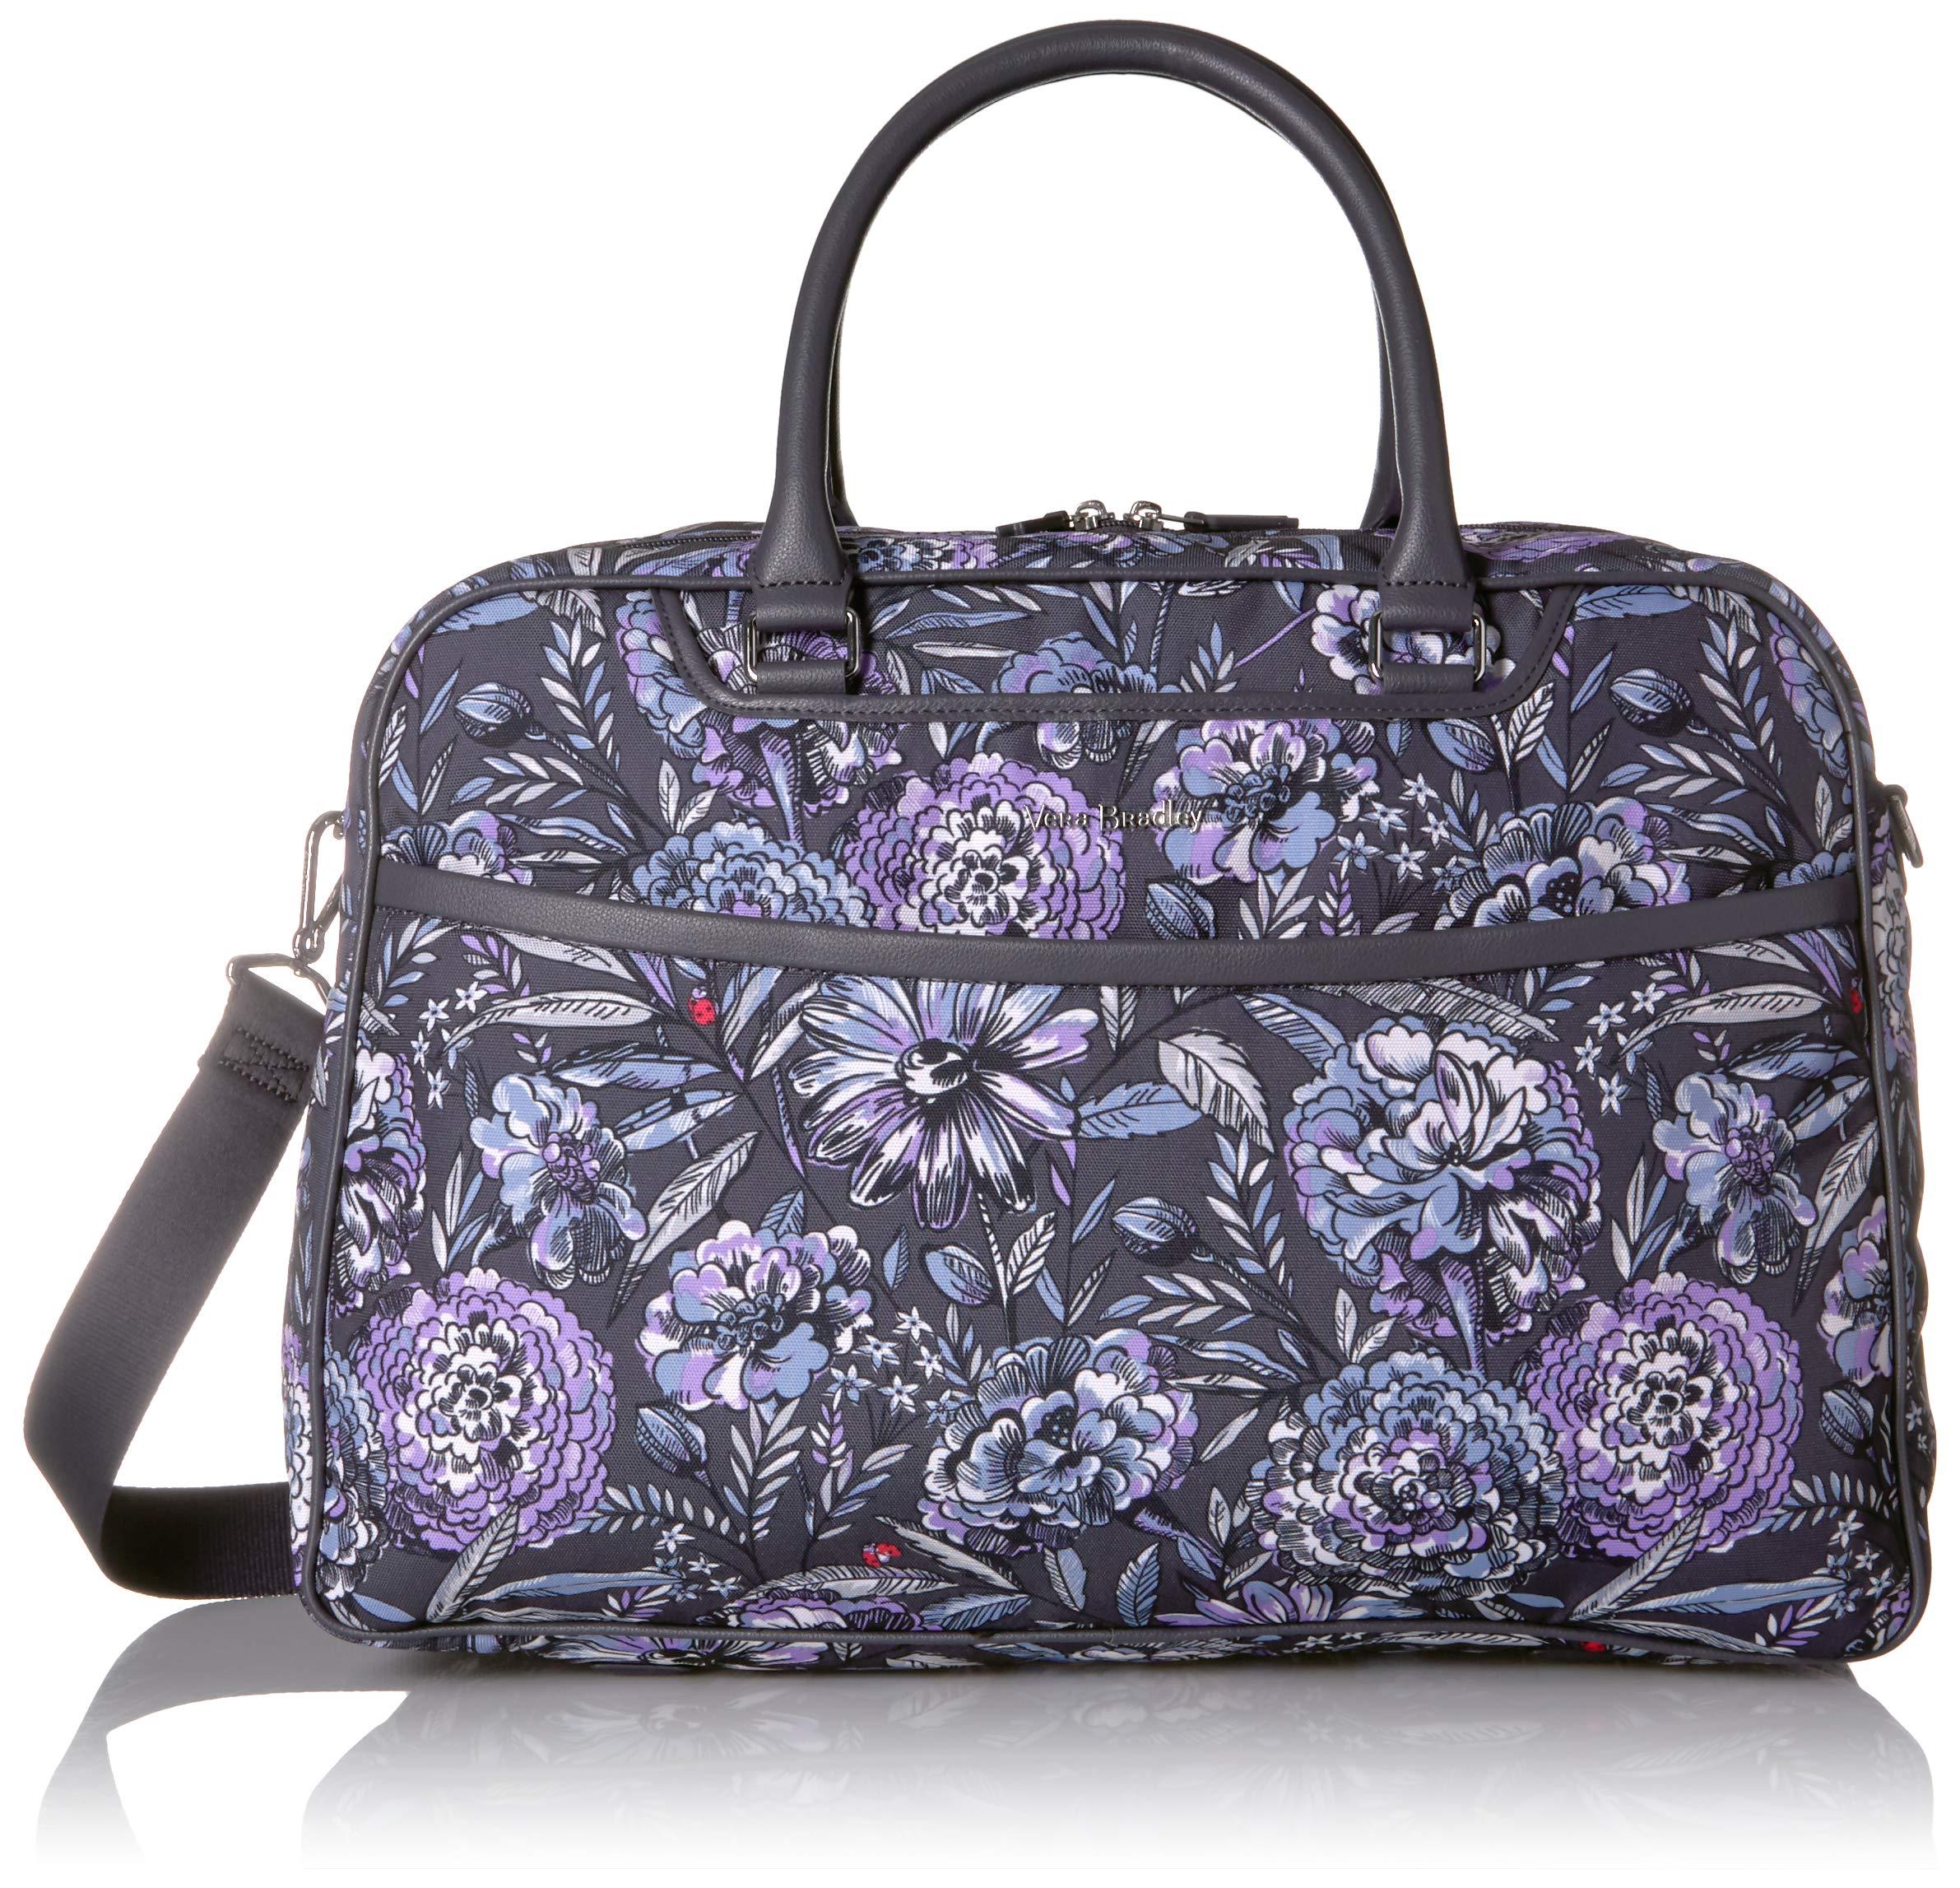 Vera Bradley Iconic Lay Flat Weekender Bag, Lavender bouquet